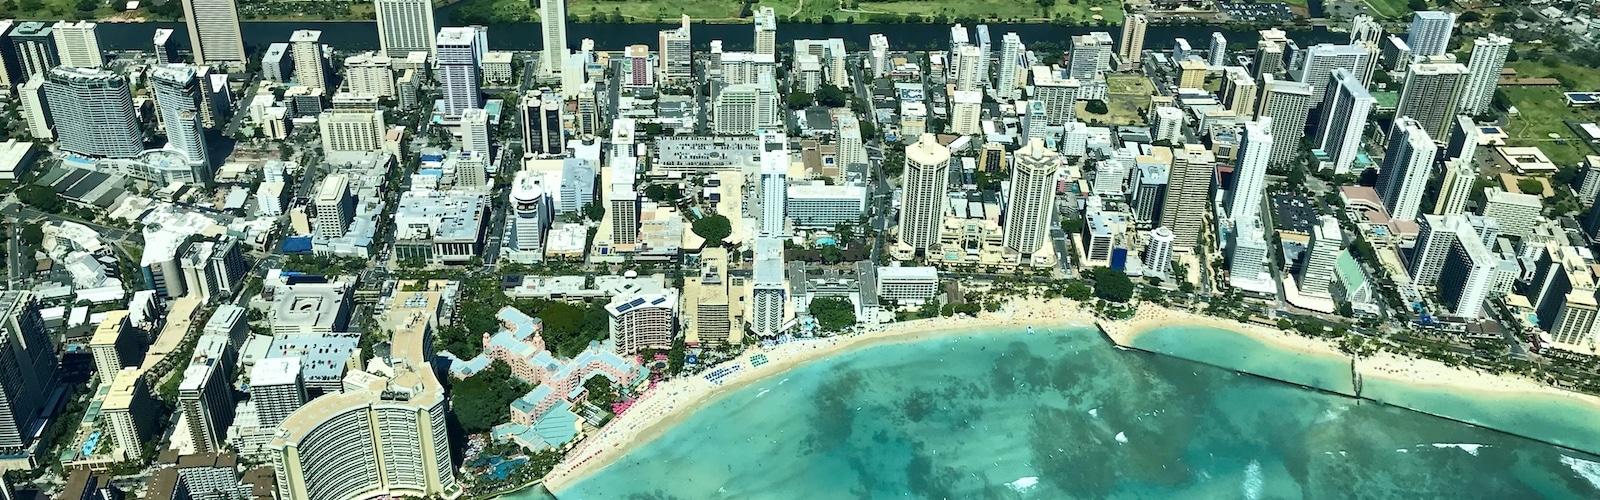 Our Waikiki Properties, Apartment Locations, Waikiki, Oahu, Hawaii